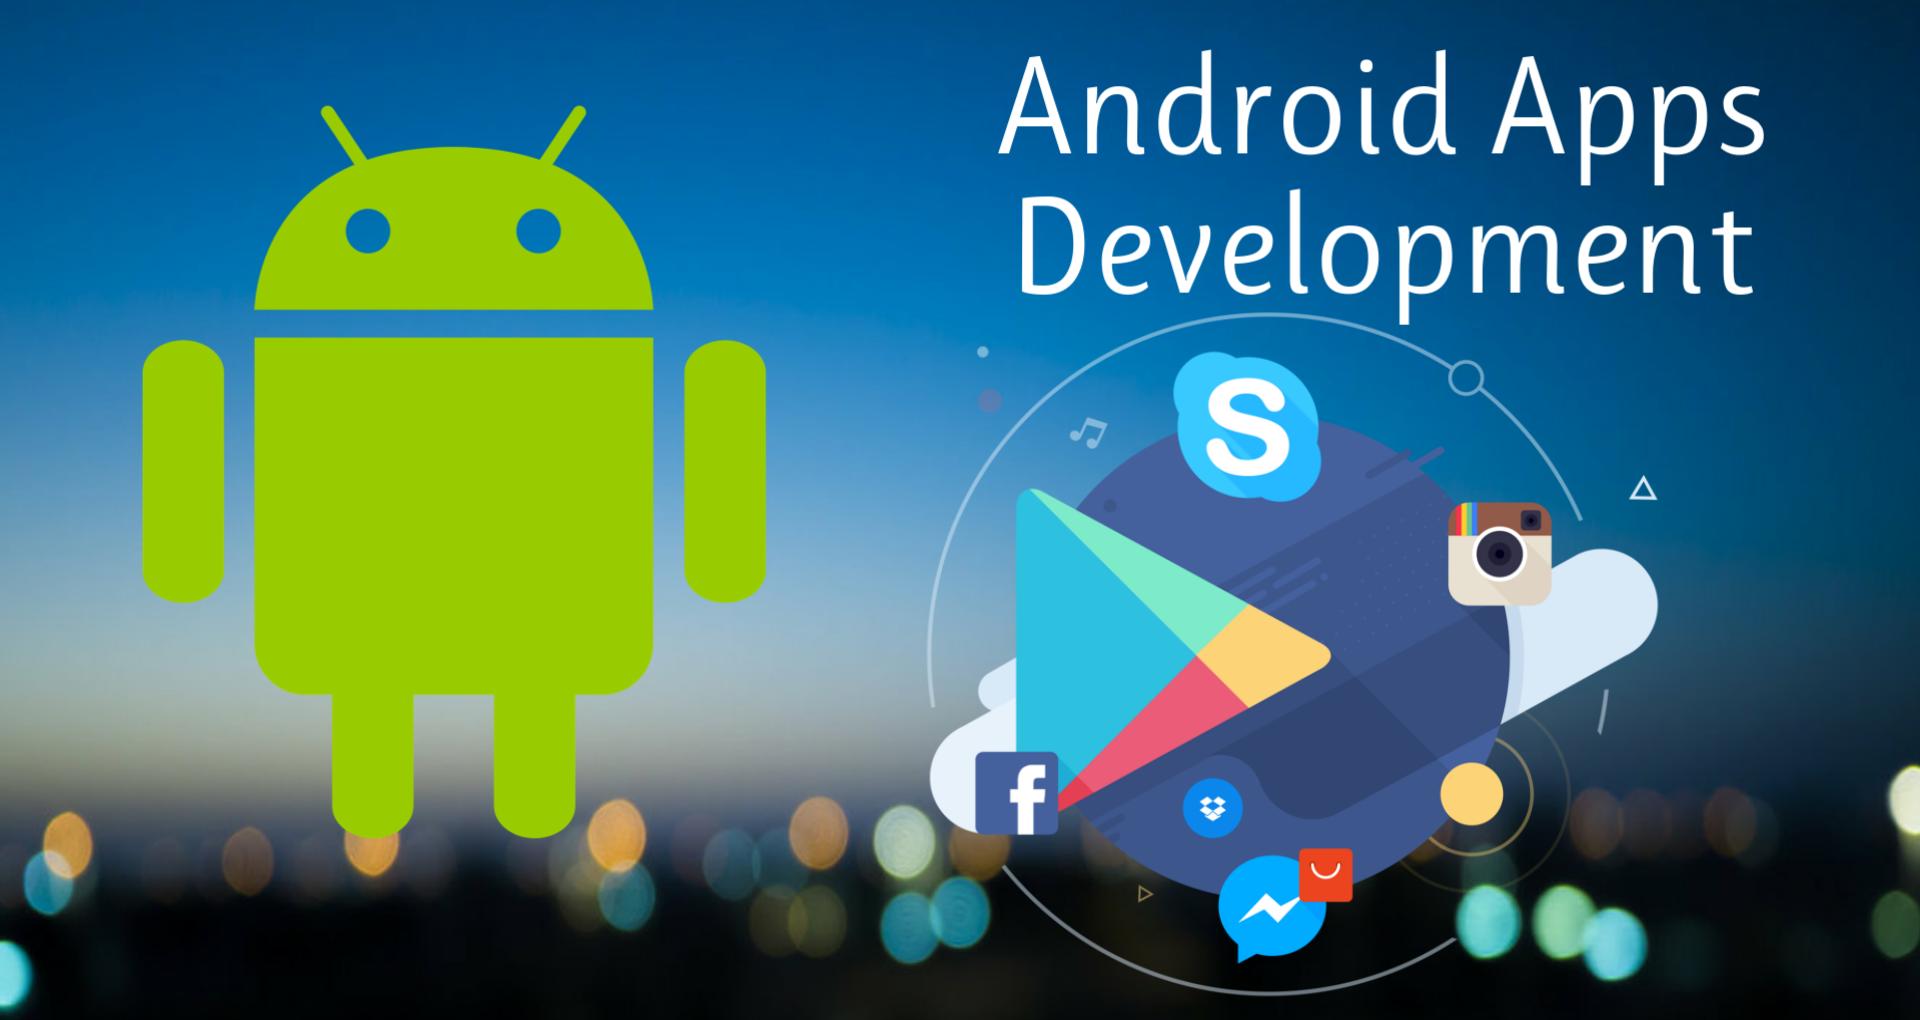 jasa pembuatan aplikasi android surabaya